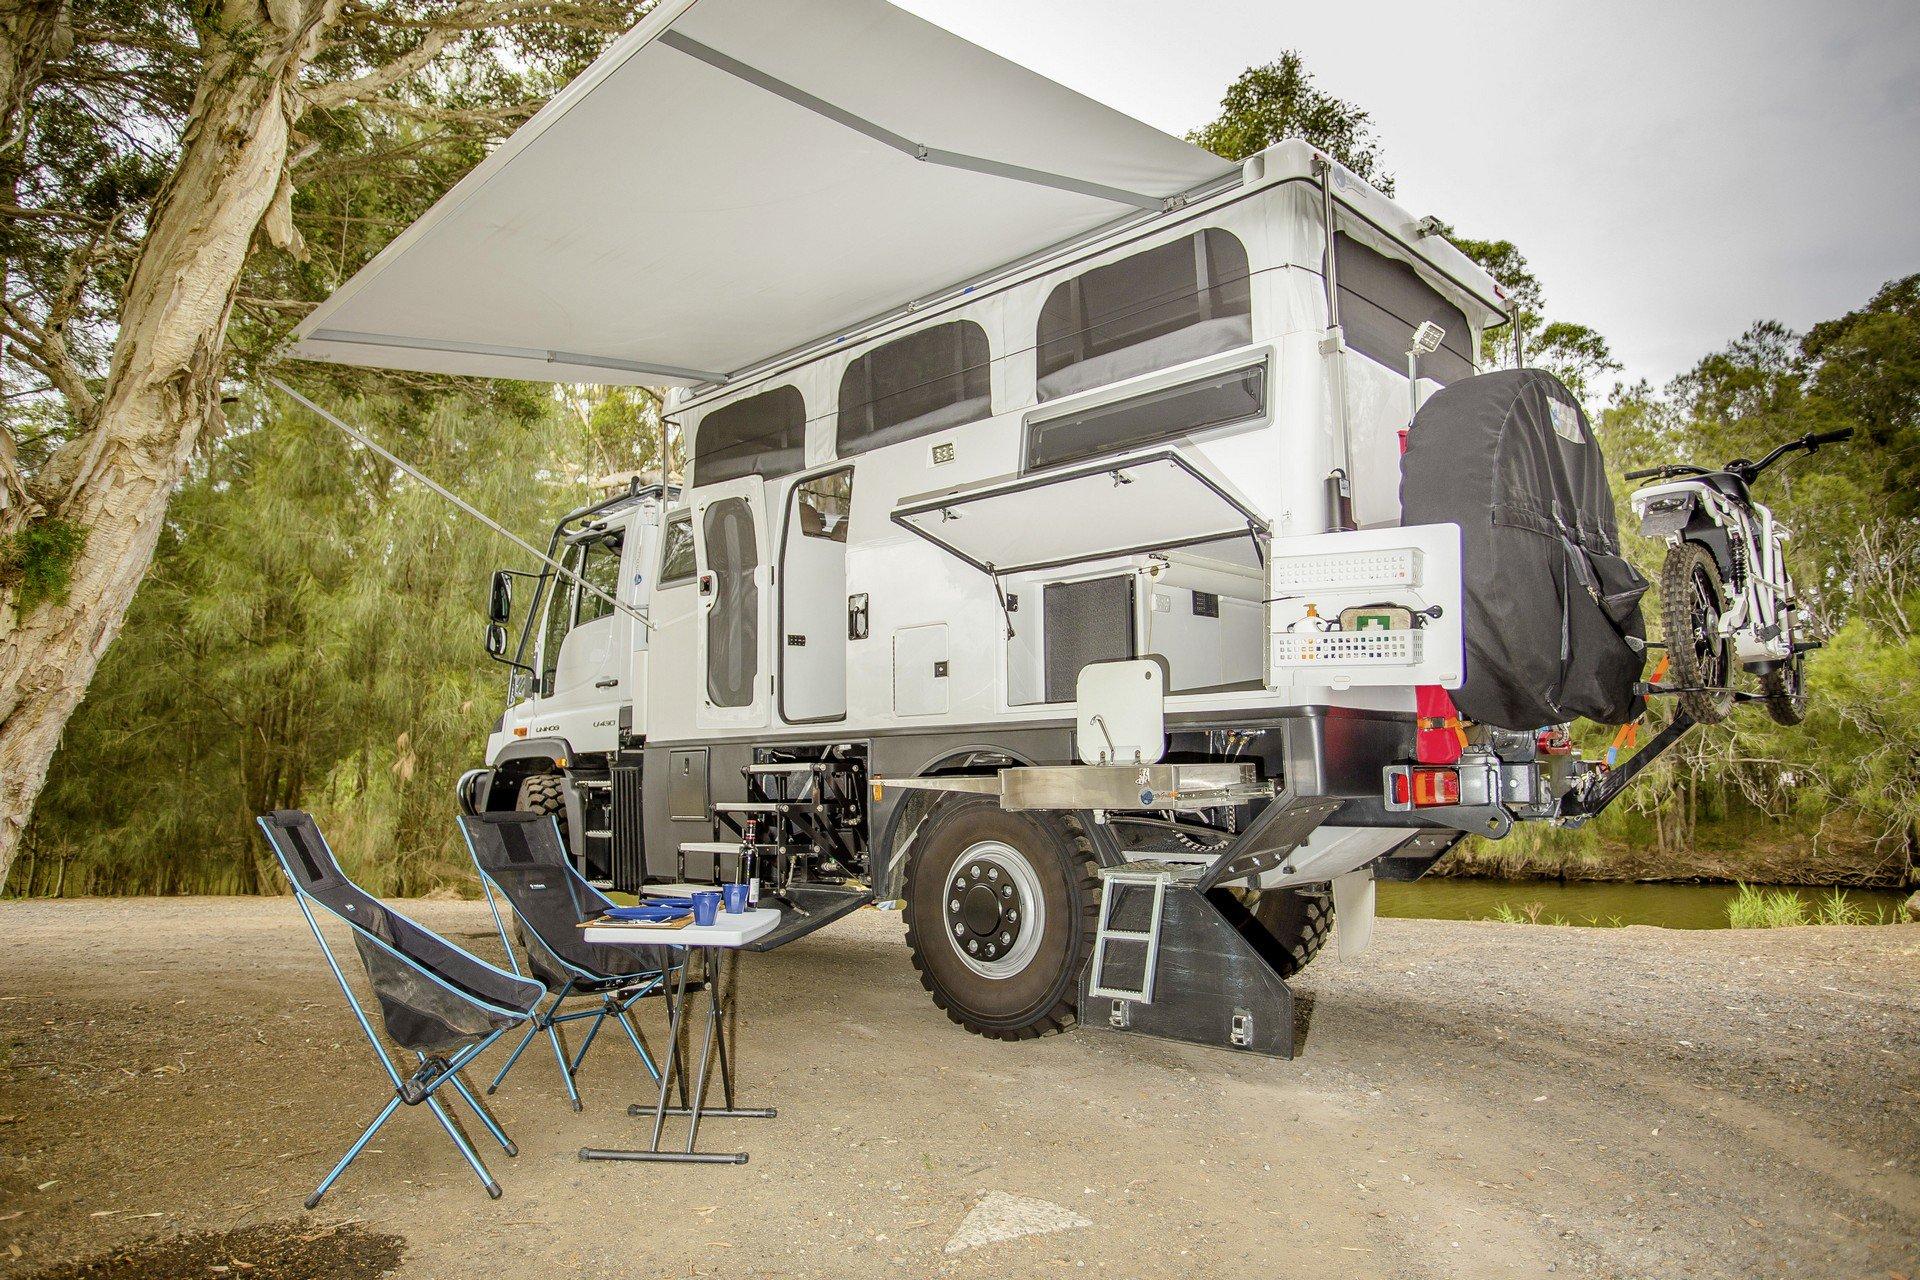 Unimog For Sale Usa >> Luxury Mercedes at the end of the world: Unimog EarthCruiser Australia Explorer XPR440 ...